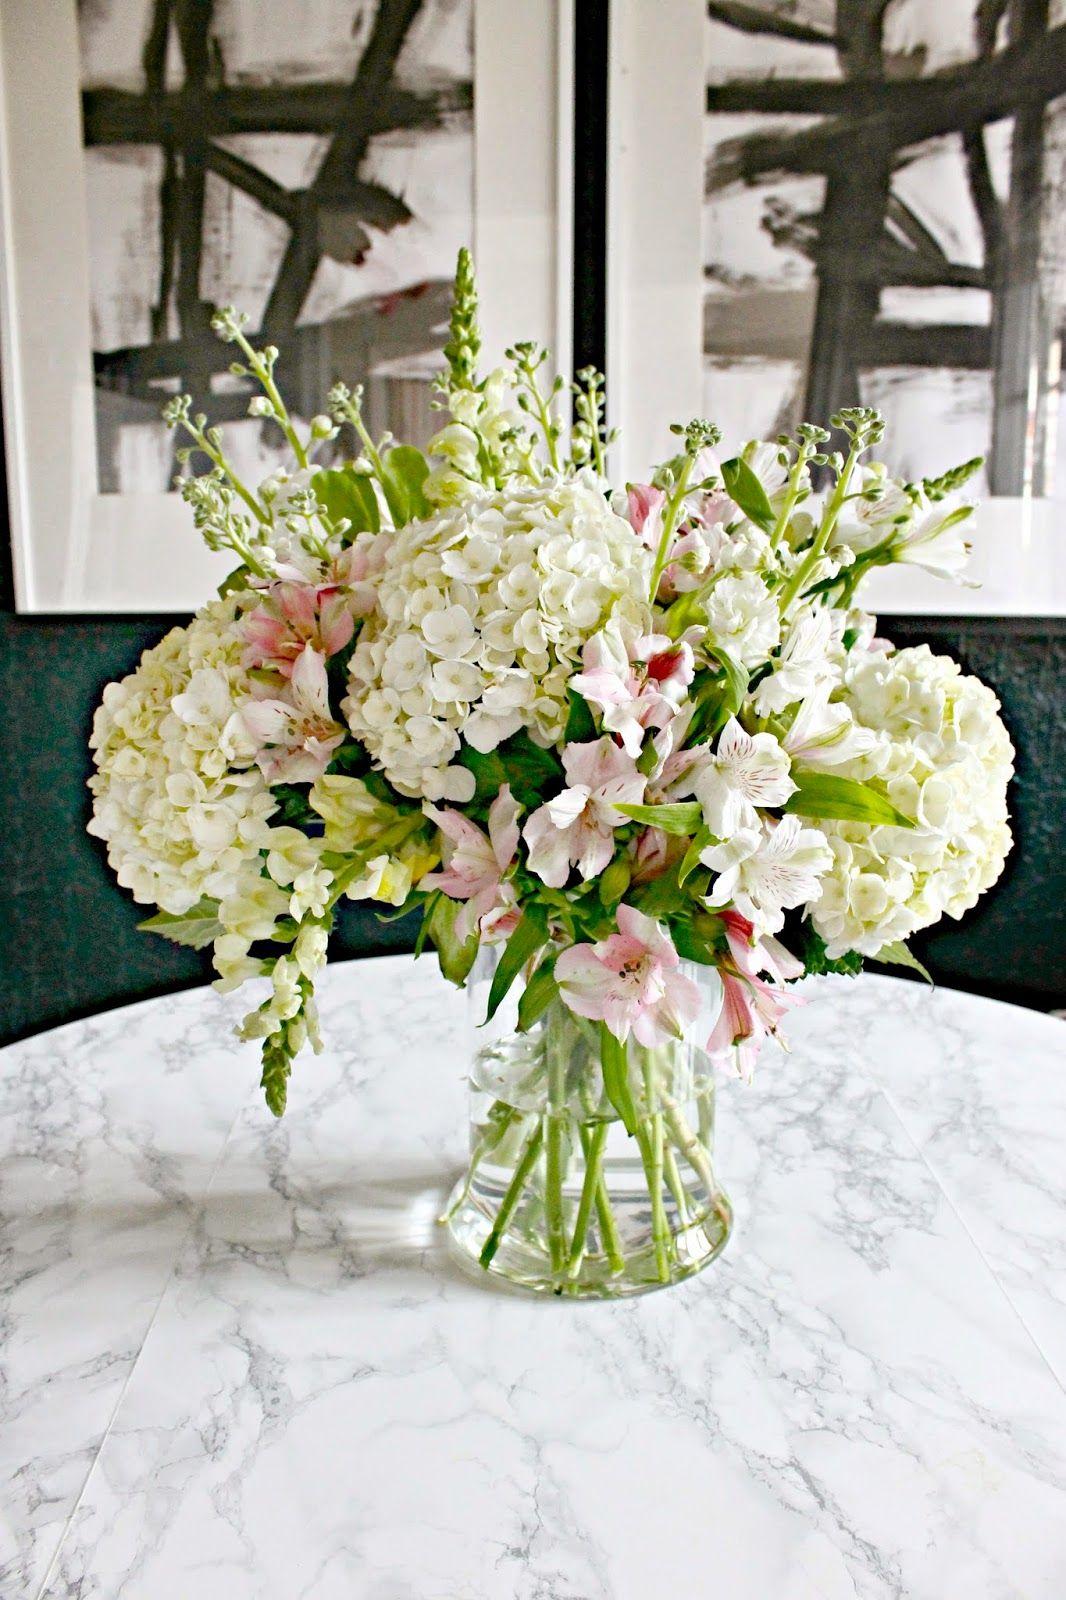 How do you find floral design ideas?